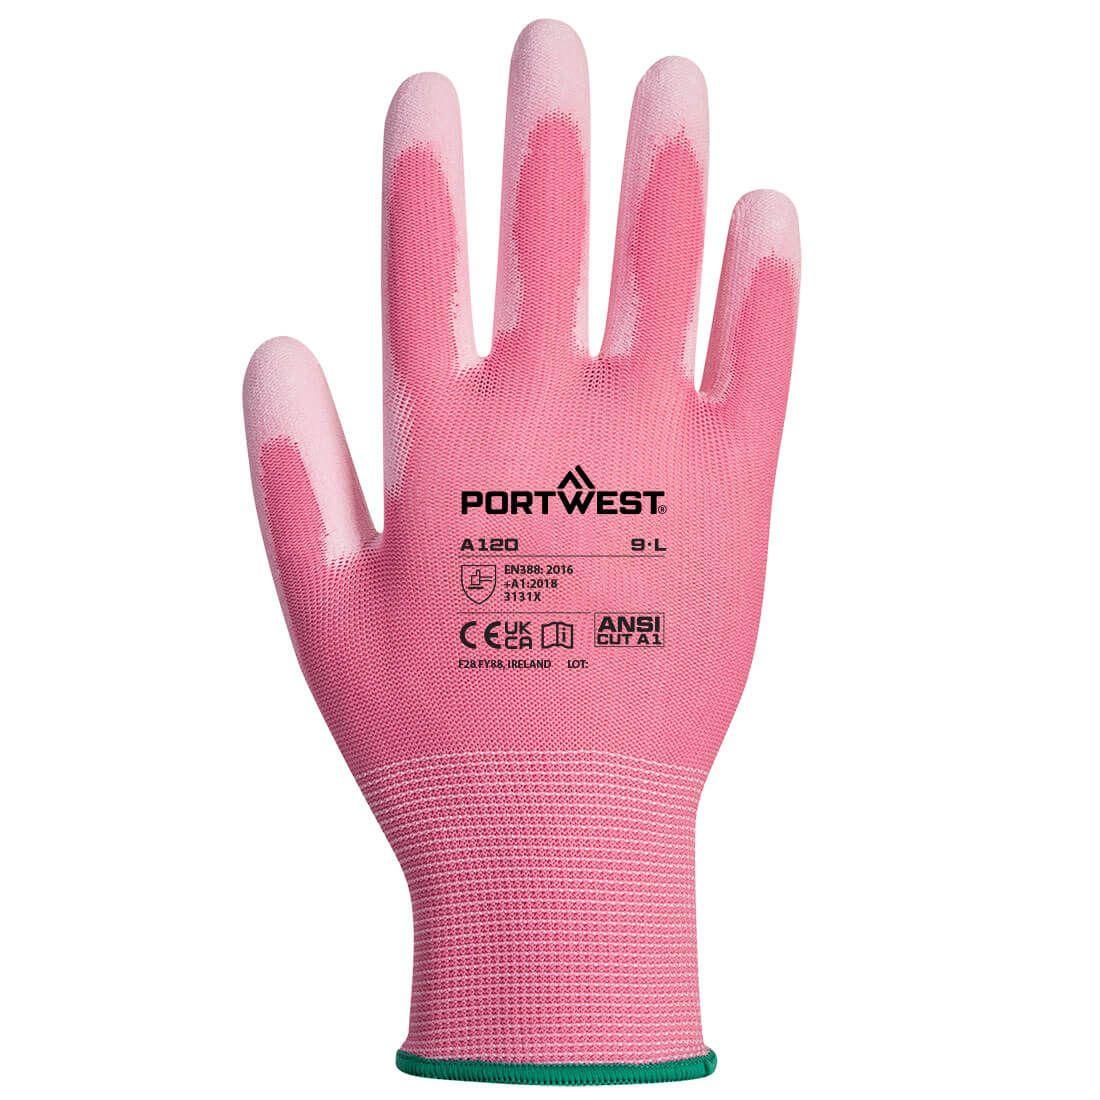 Portwest Handschoenen A120 roze(P9)